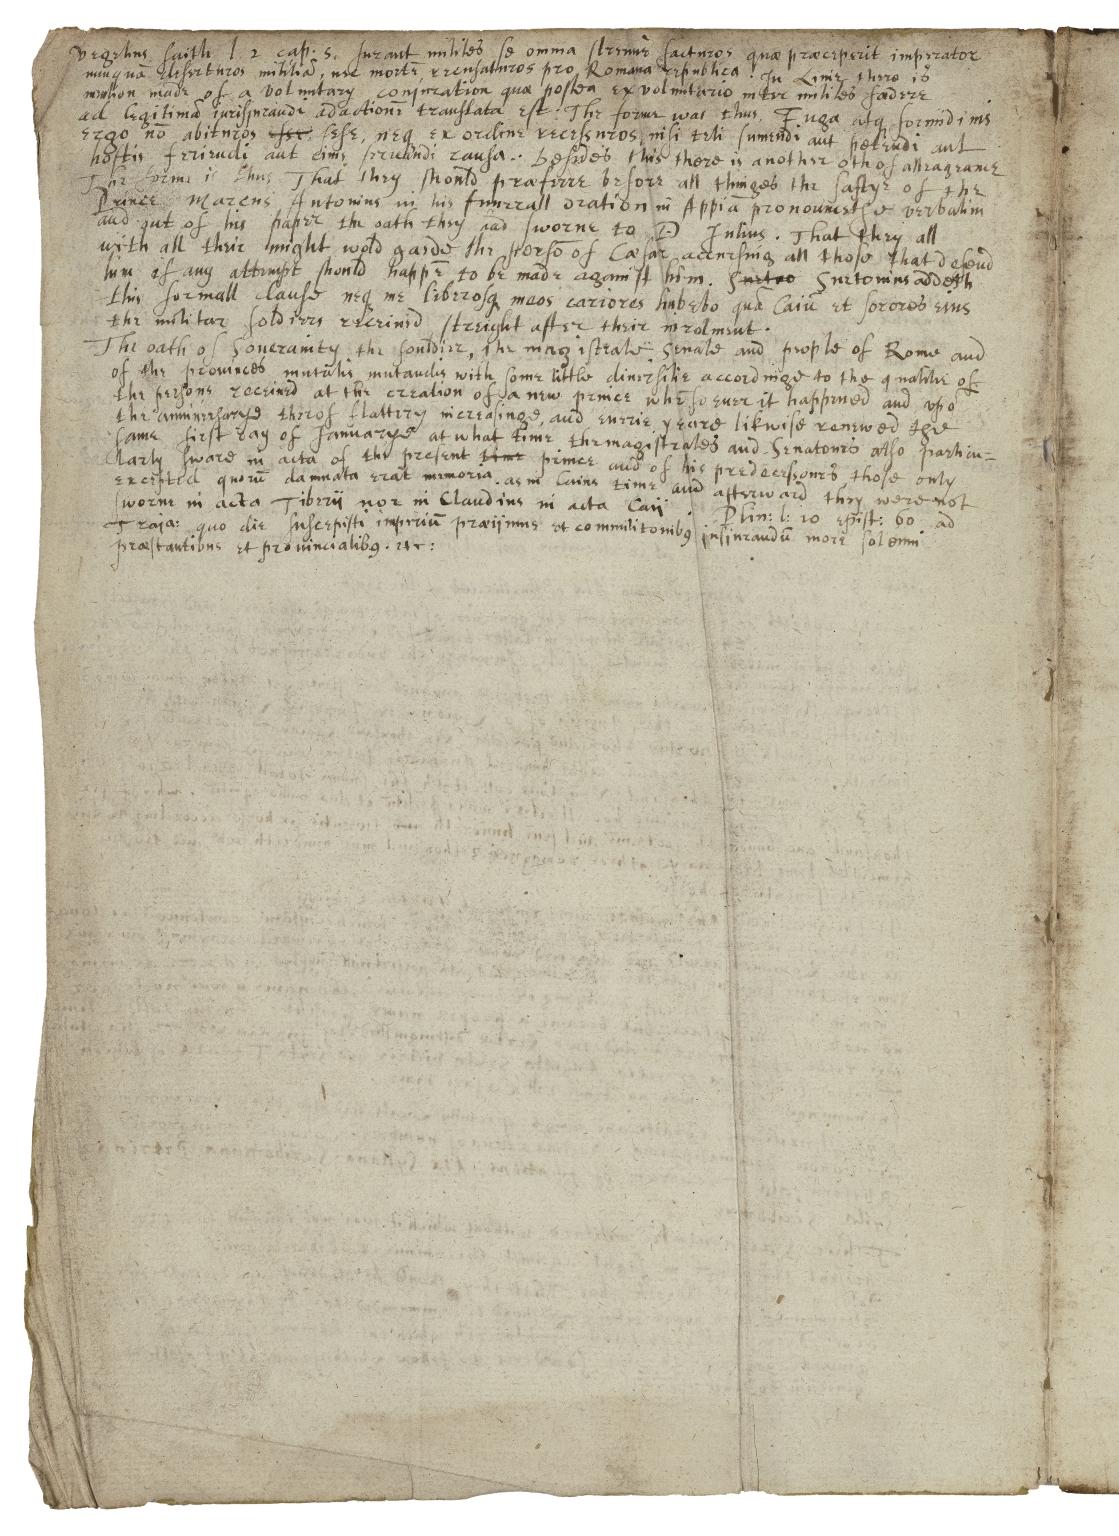 [De militia Romana libri quinque] Iusti LipsI De militia romana libri quinque : commentarius ad Polybium.